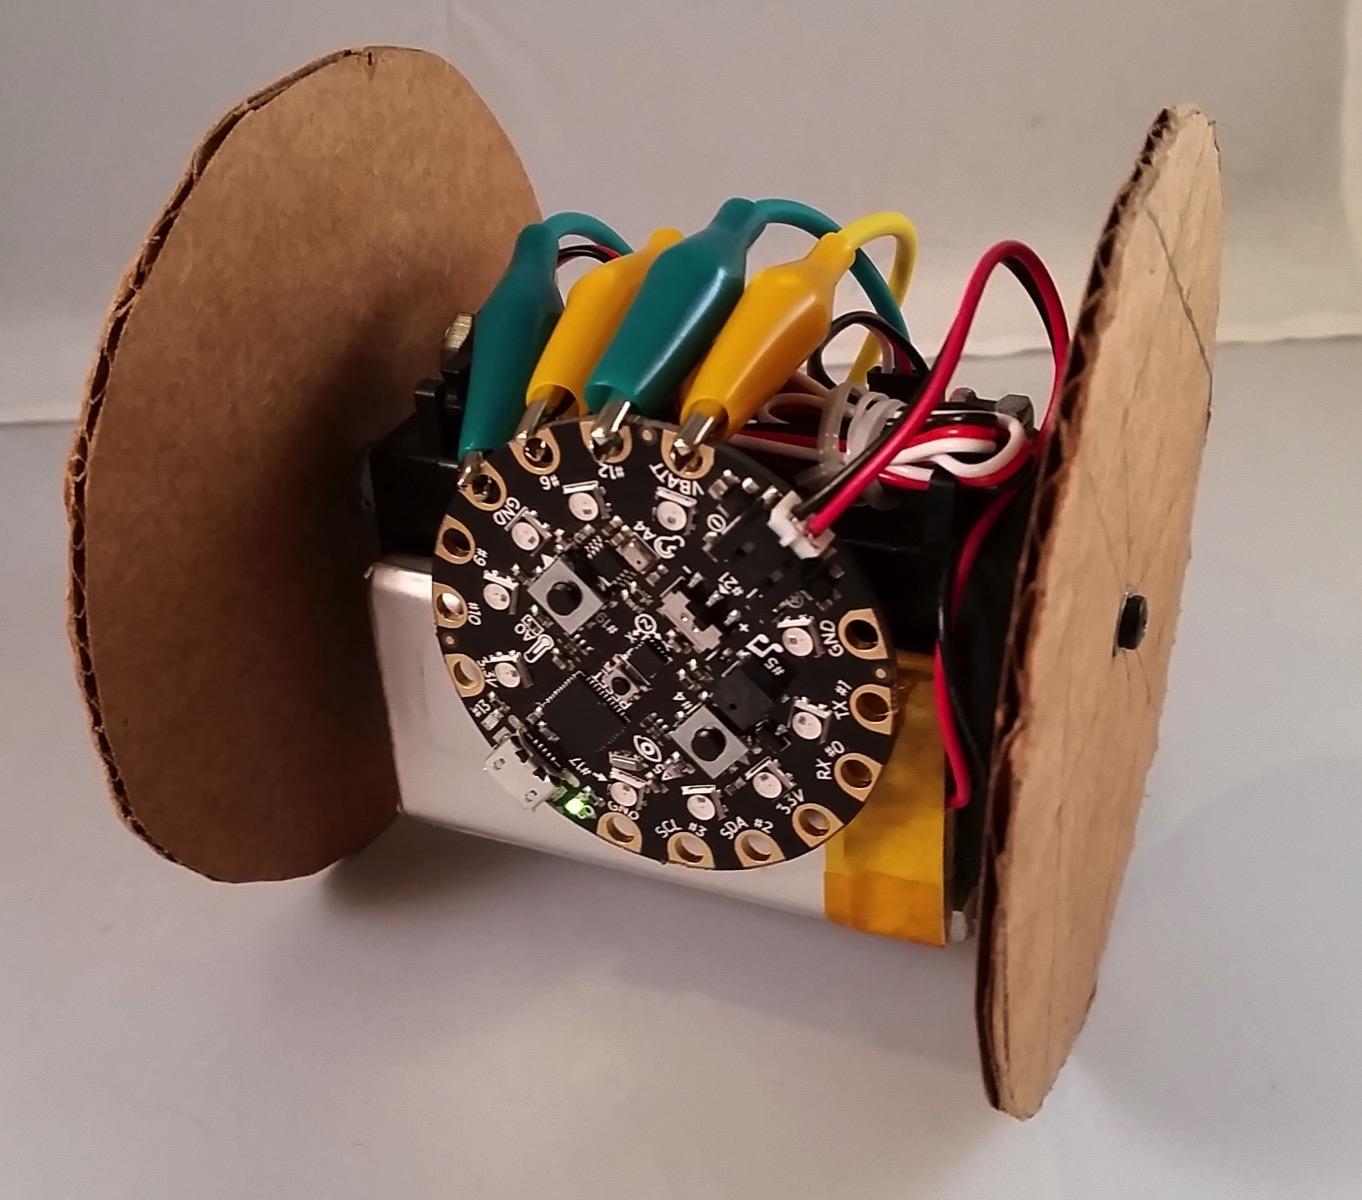 Circuit playground robot